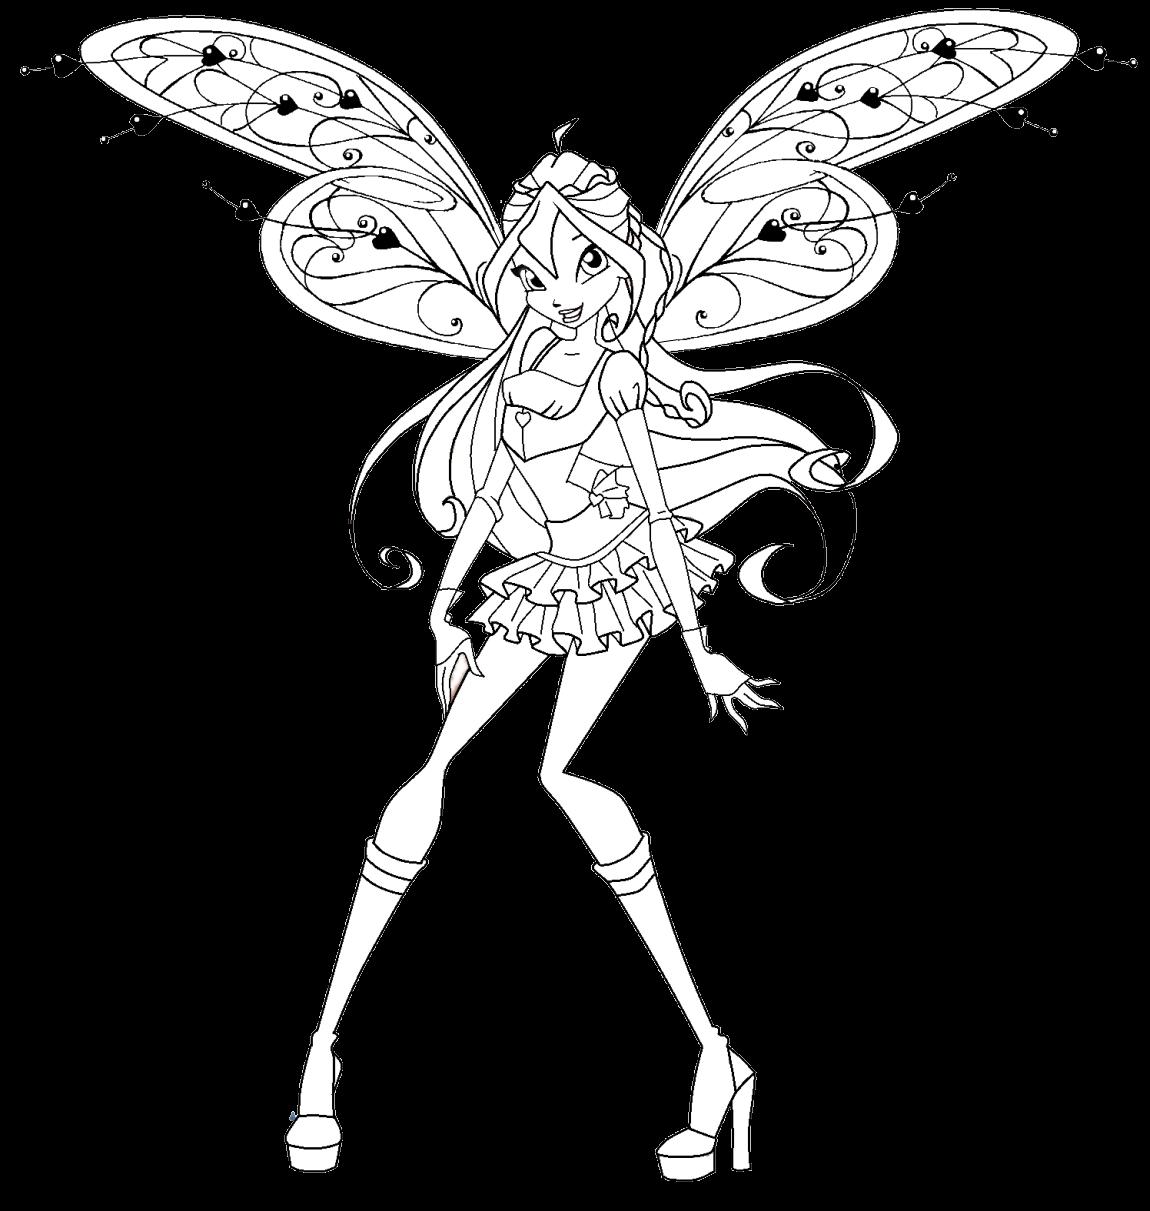 winx believix coloring pages | Winx Club All: Colorear: Colorea a Bloom Believix